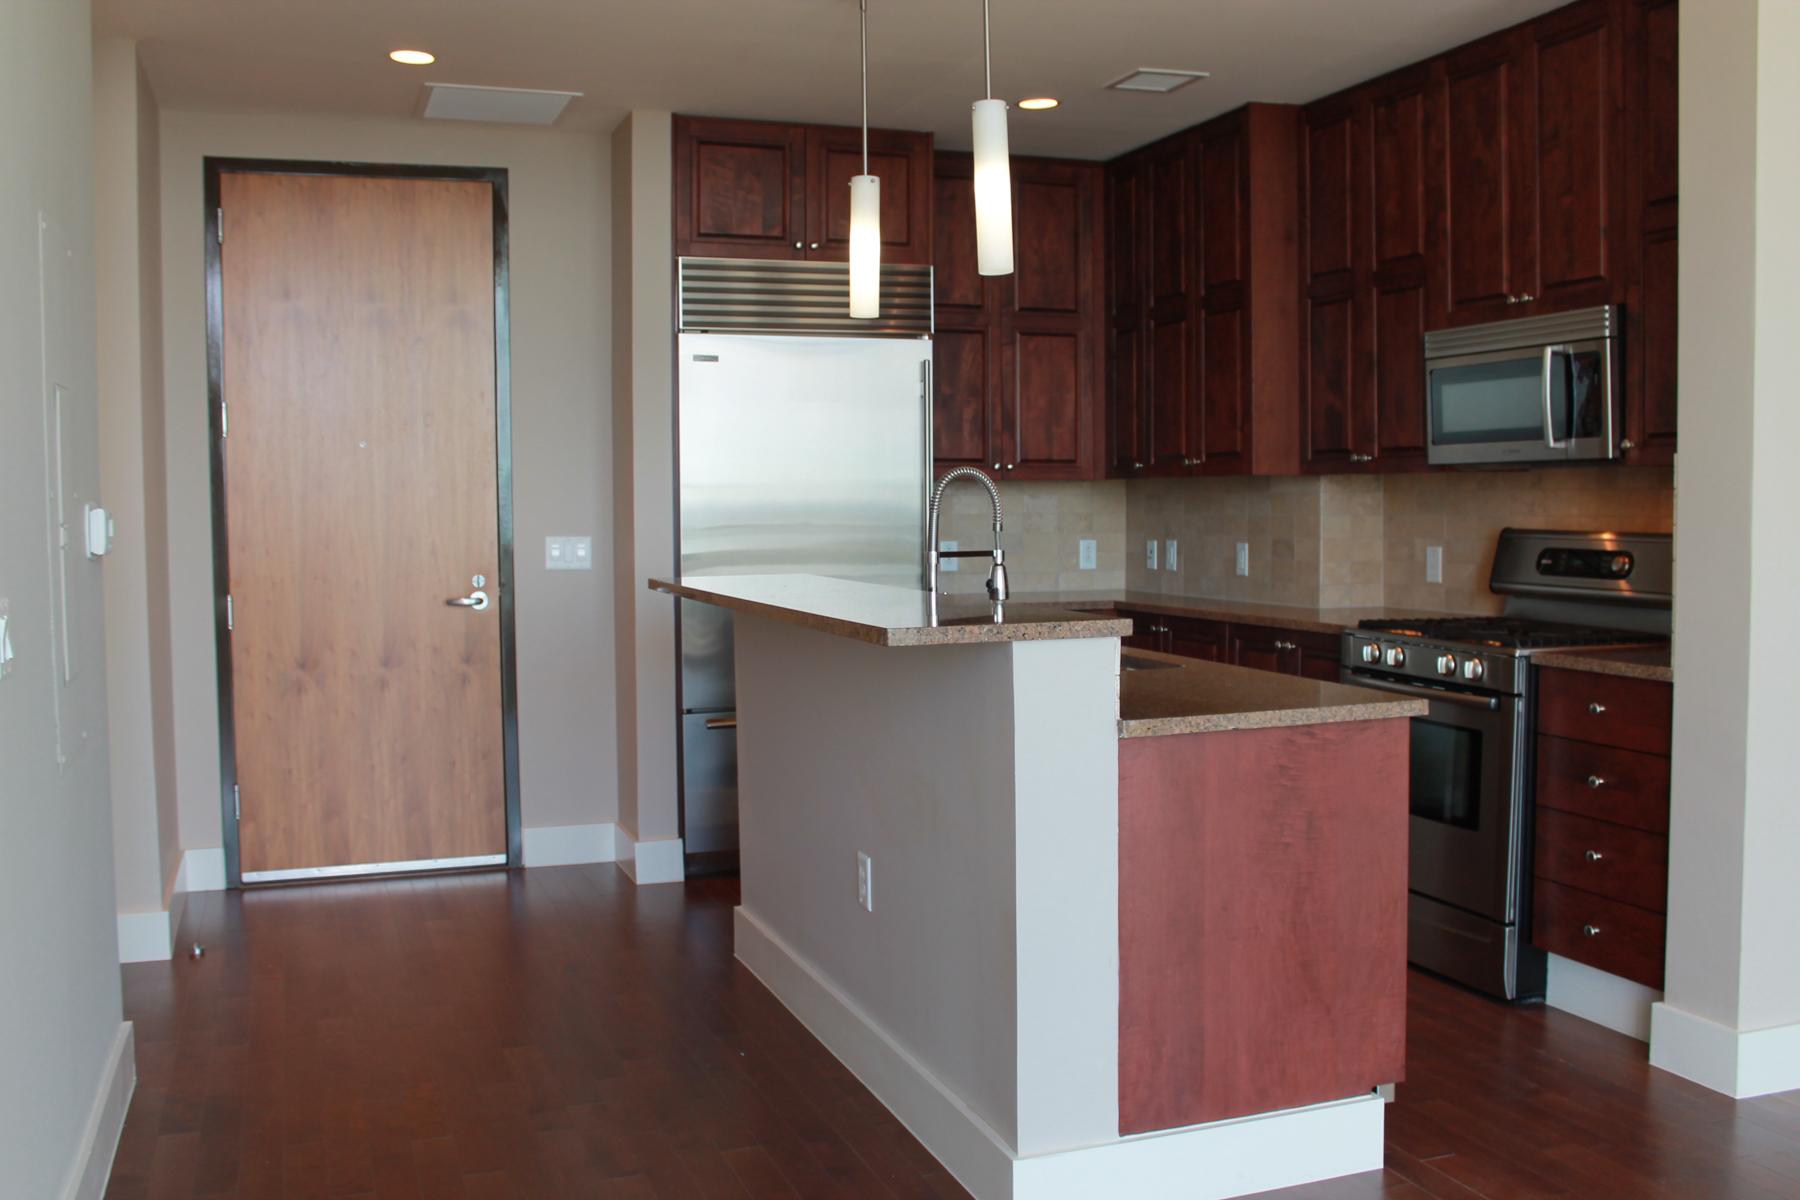 Residencial - Outro para Venda às Urban Living at its Finest 610 E Market St 2613 Alteza, San Antonio, Texas 78205 Estados Unidos